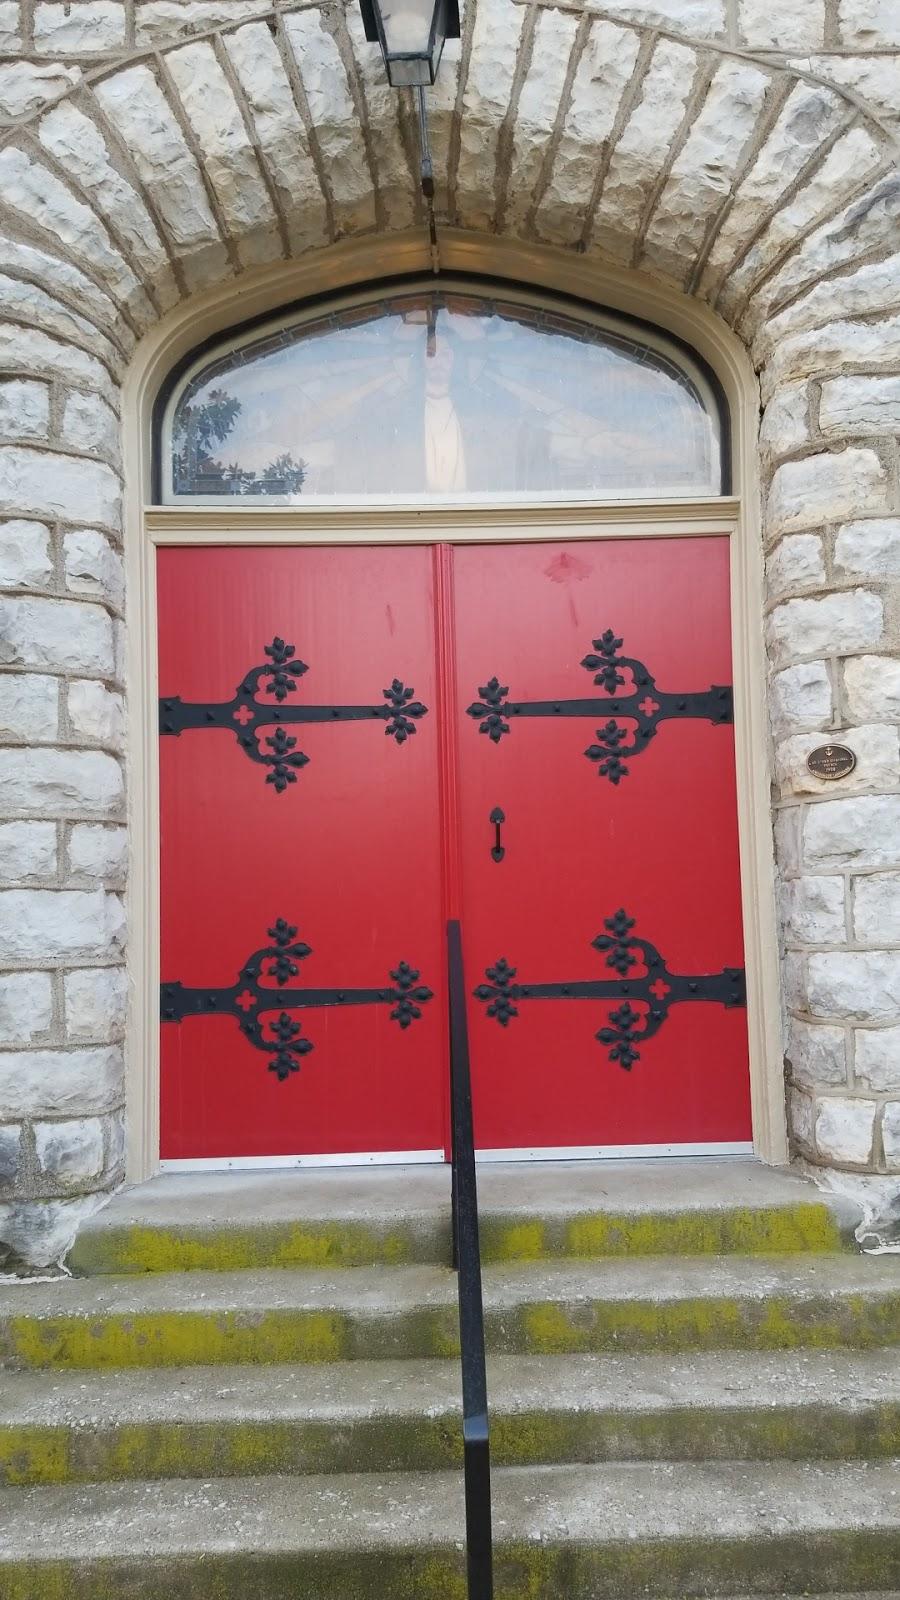 St Lukes Episcopal Church - church  | Photo 4 of 10 | Address: 1206 Maple Ln, Louisville, KY 40223, USA | Phone: (502) 245-8827